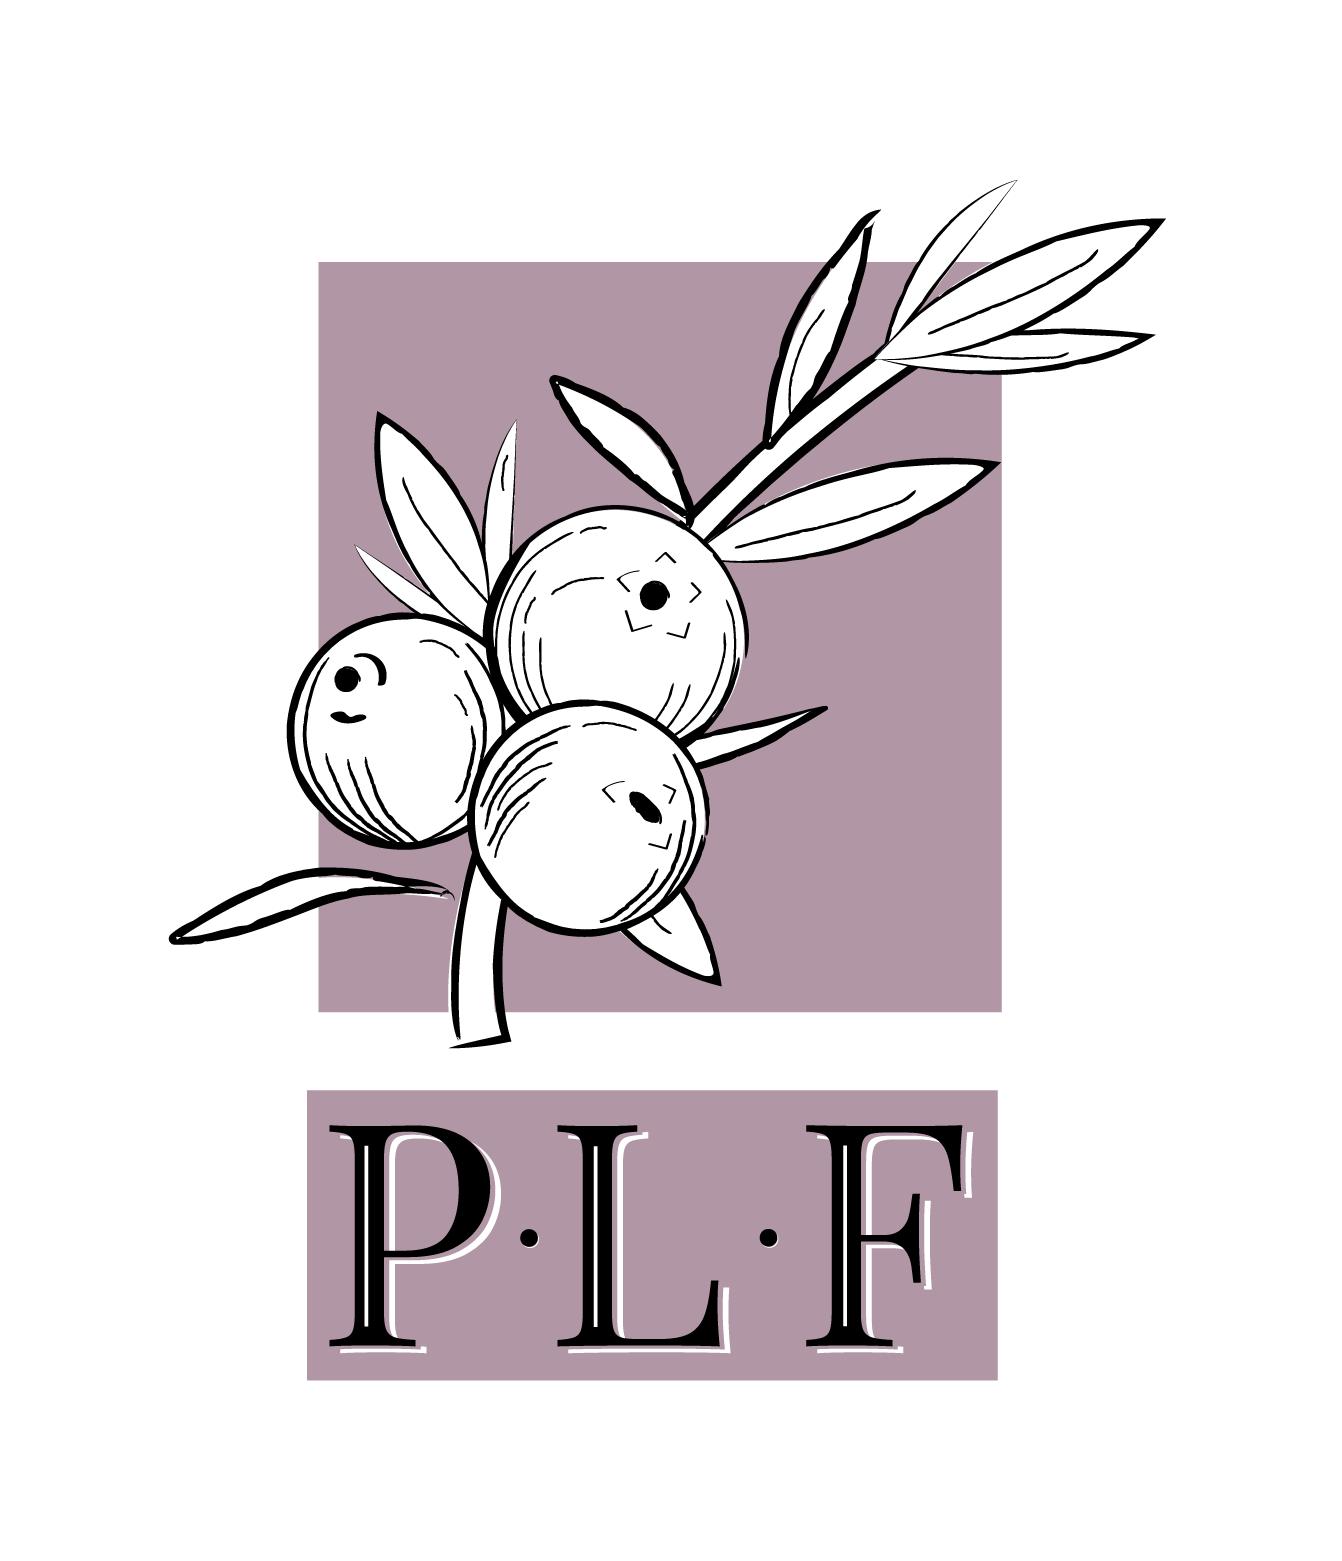 Logo concept 2 - purple with illustration